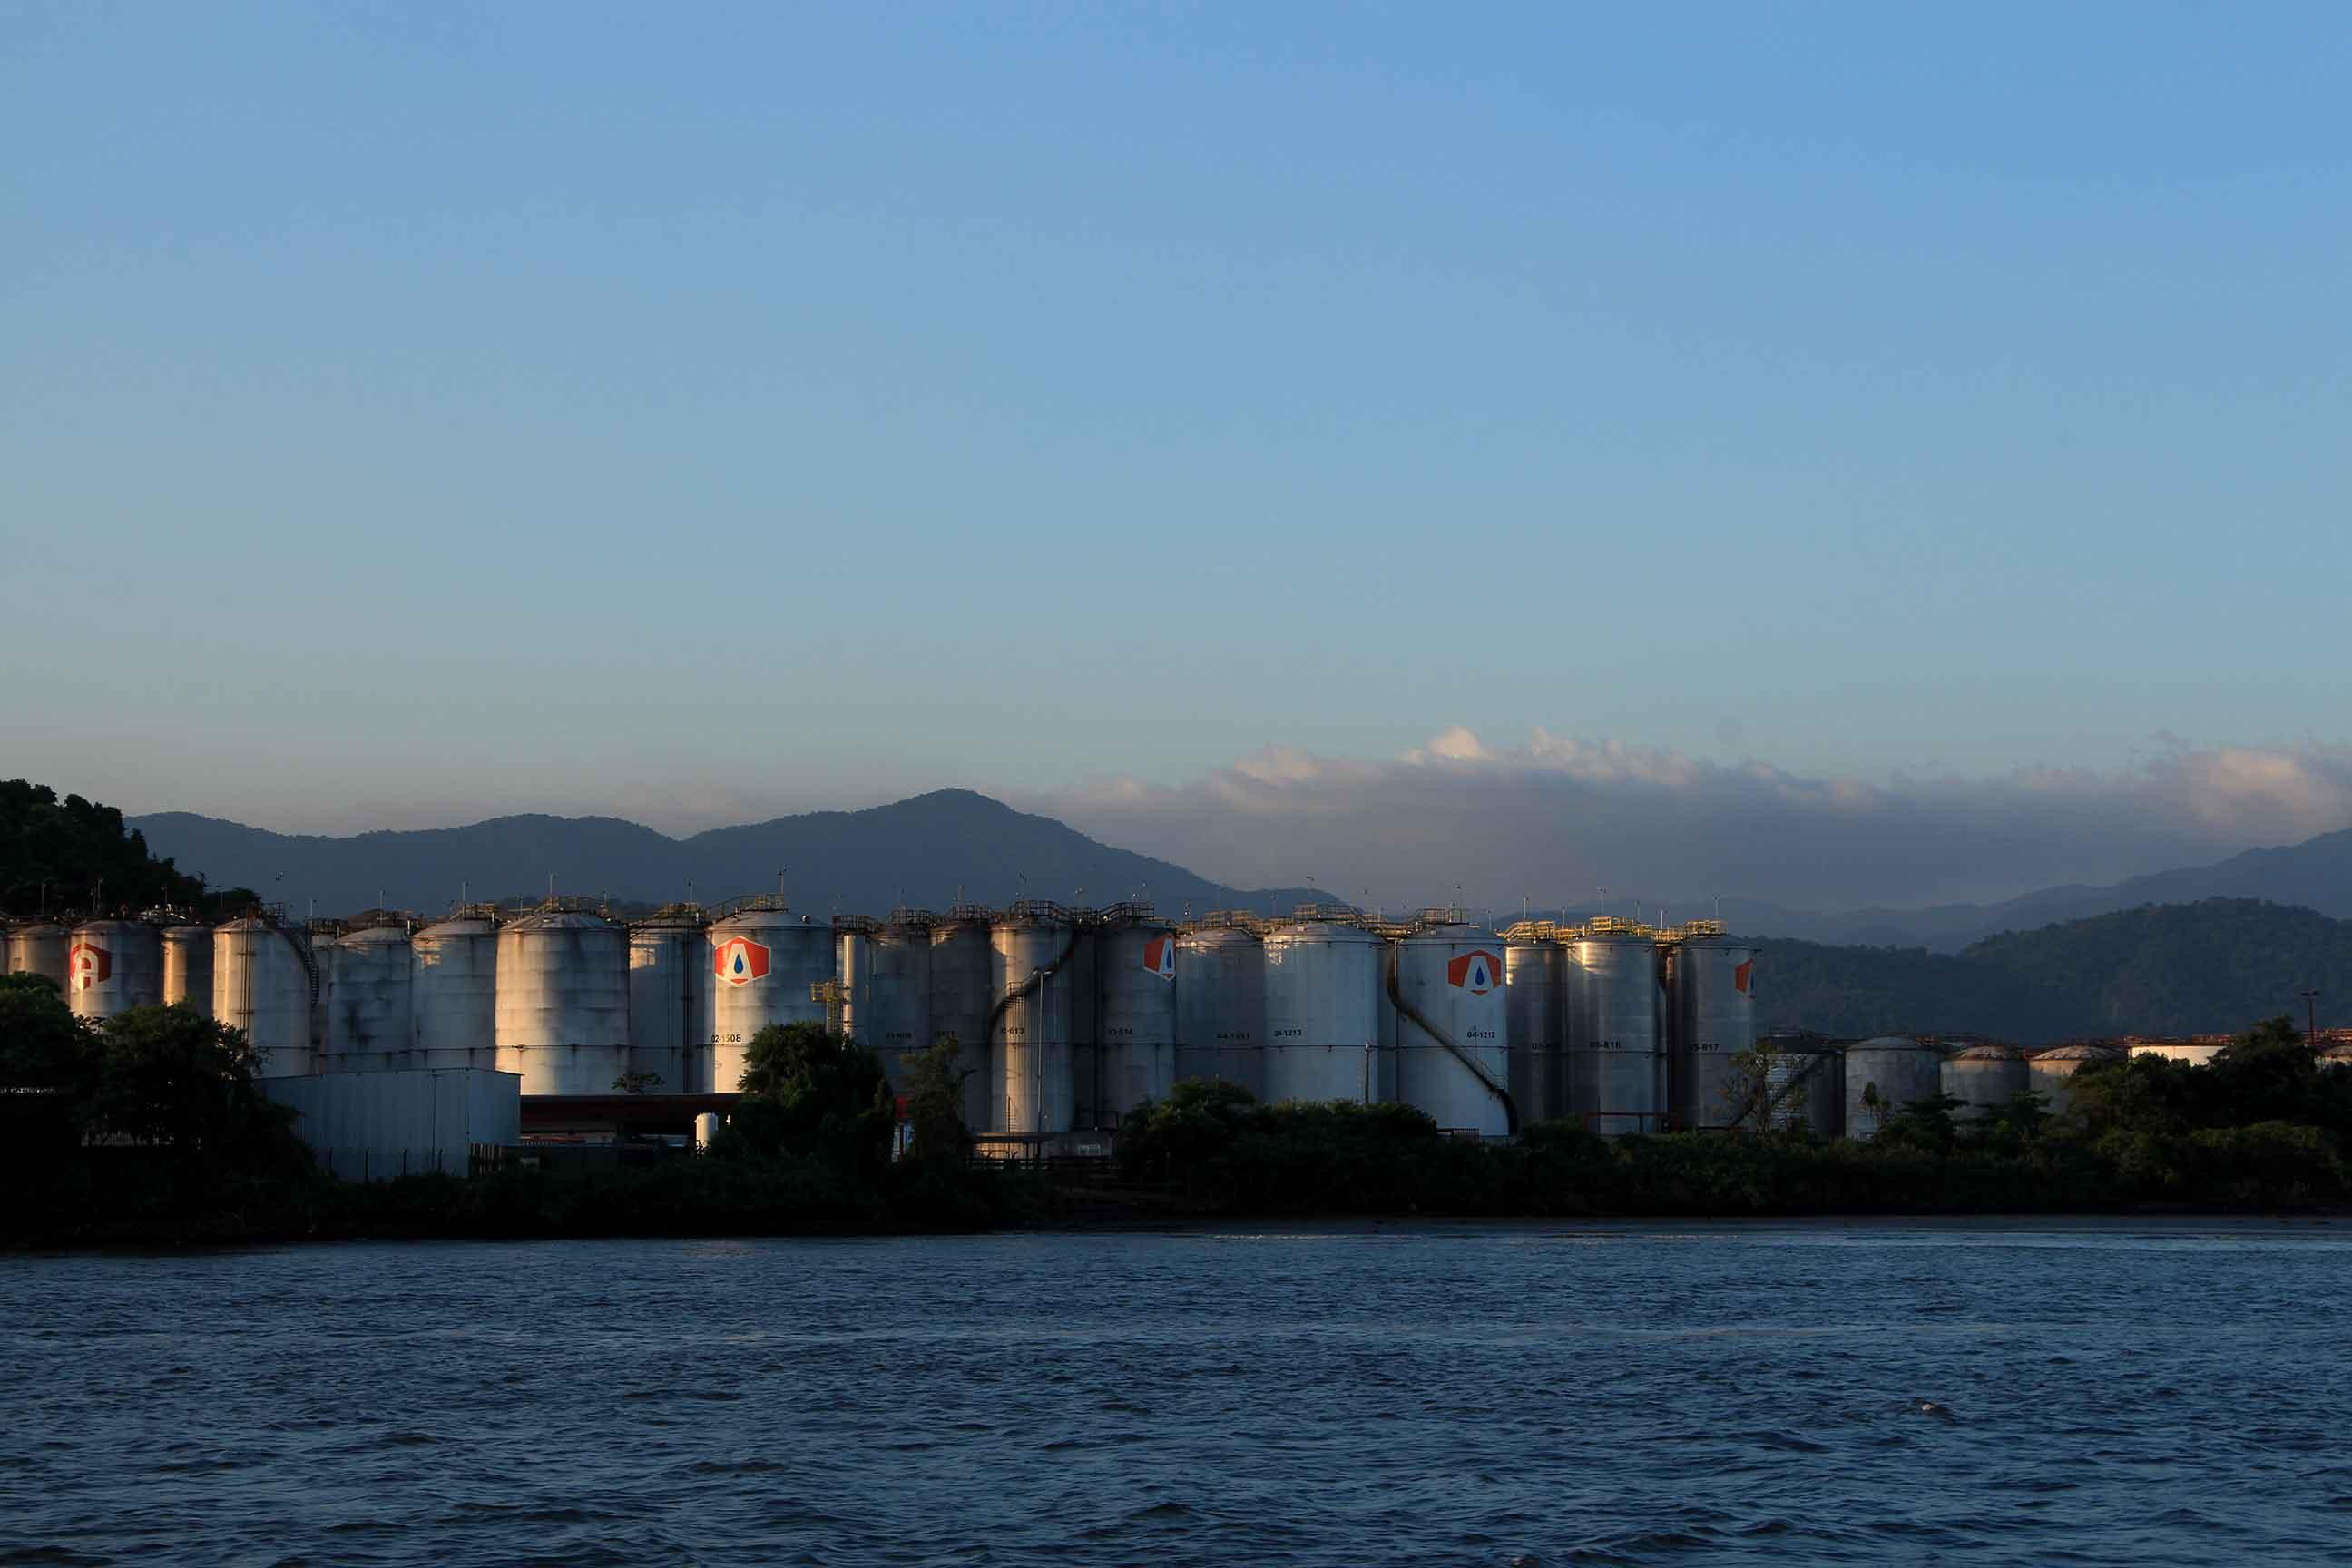 Ilhas de Santos - meio-ambiente-ilha-barnabe-img_5562-bx